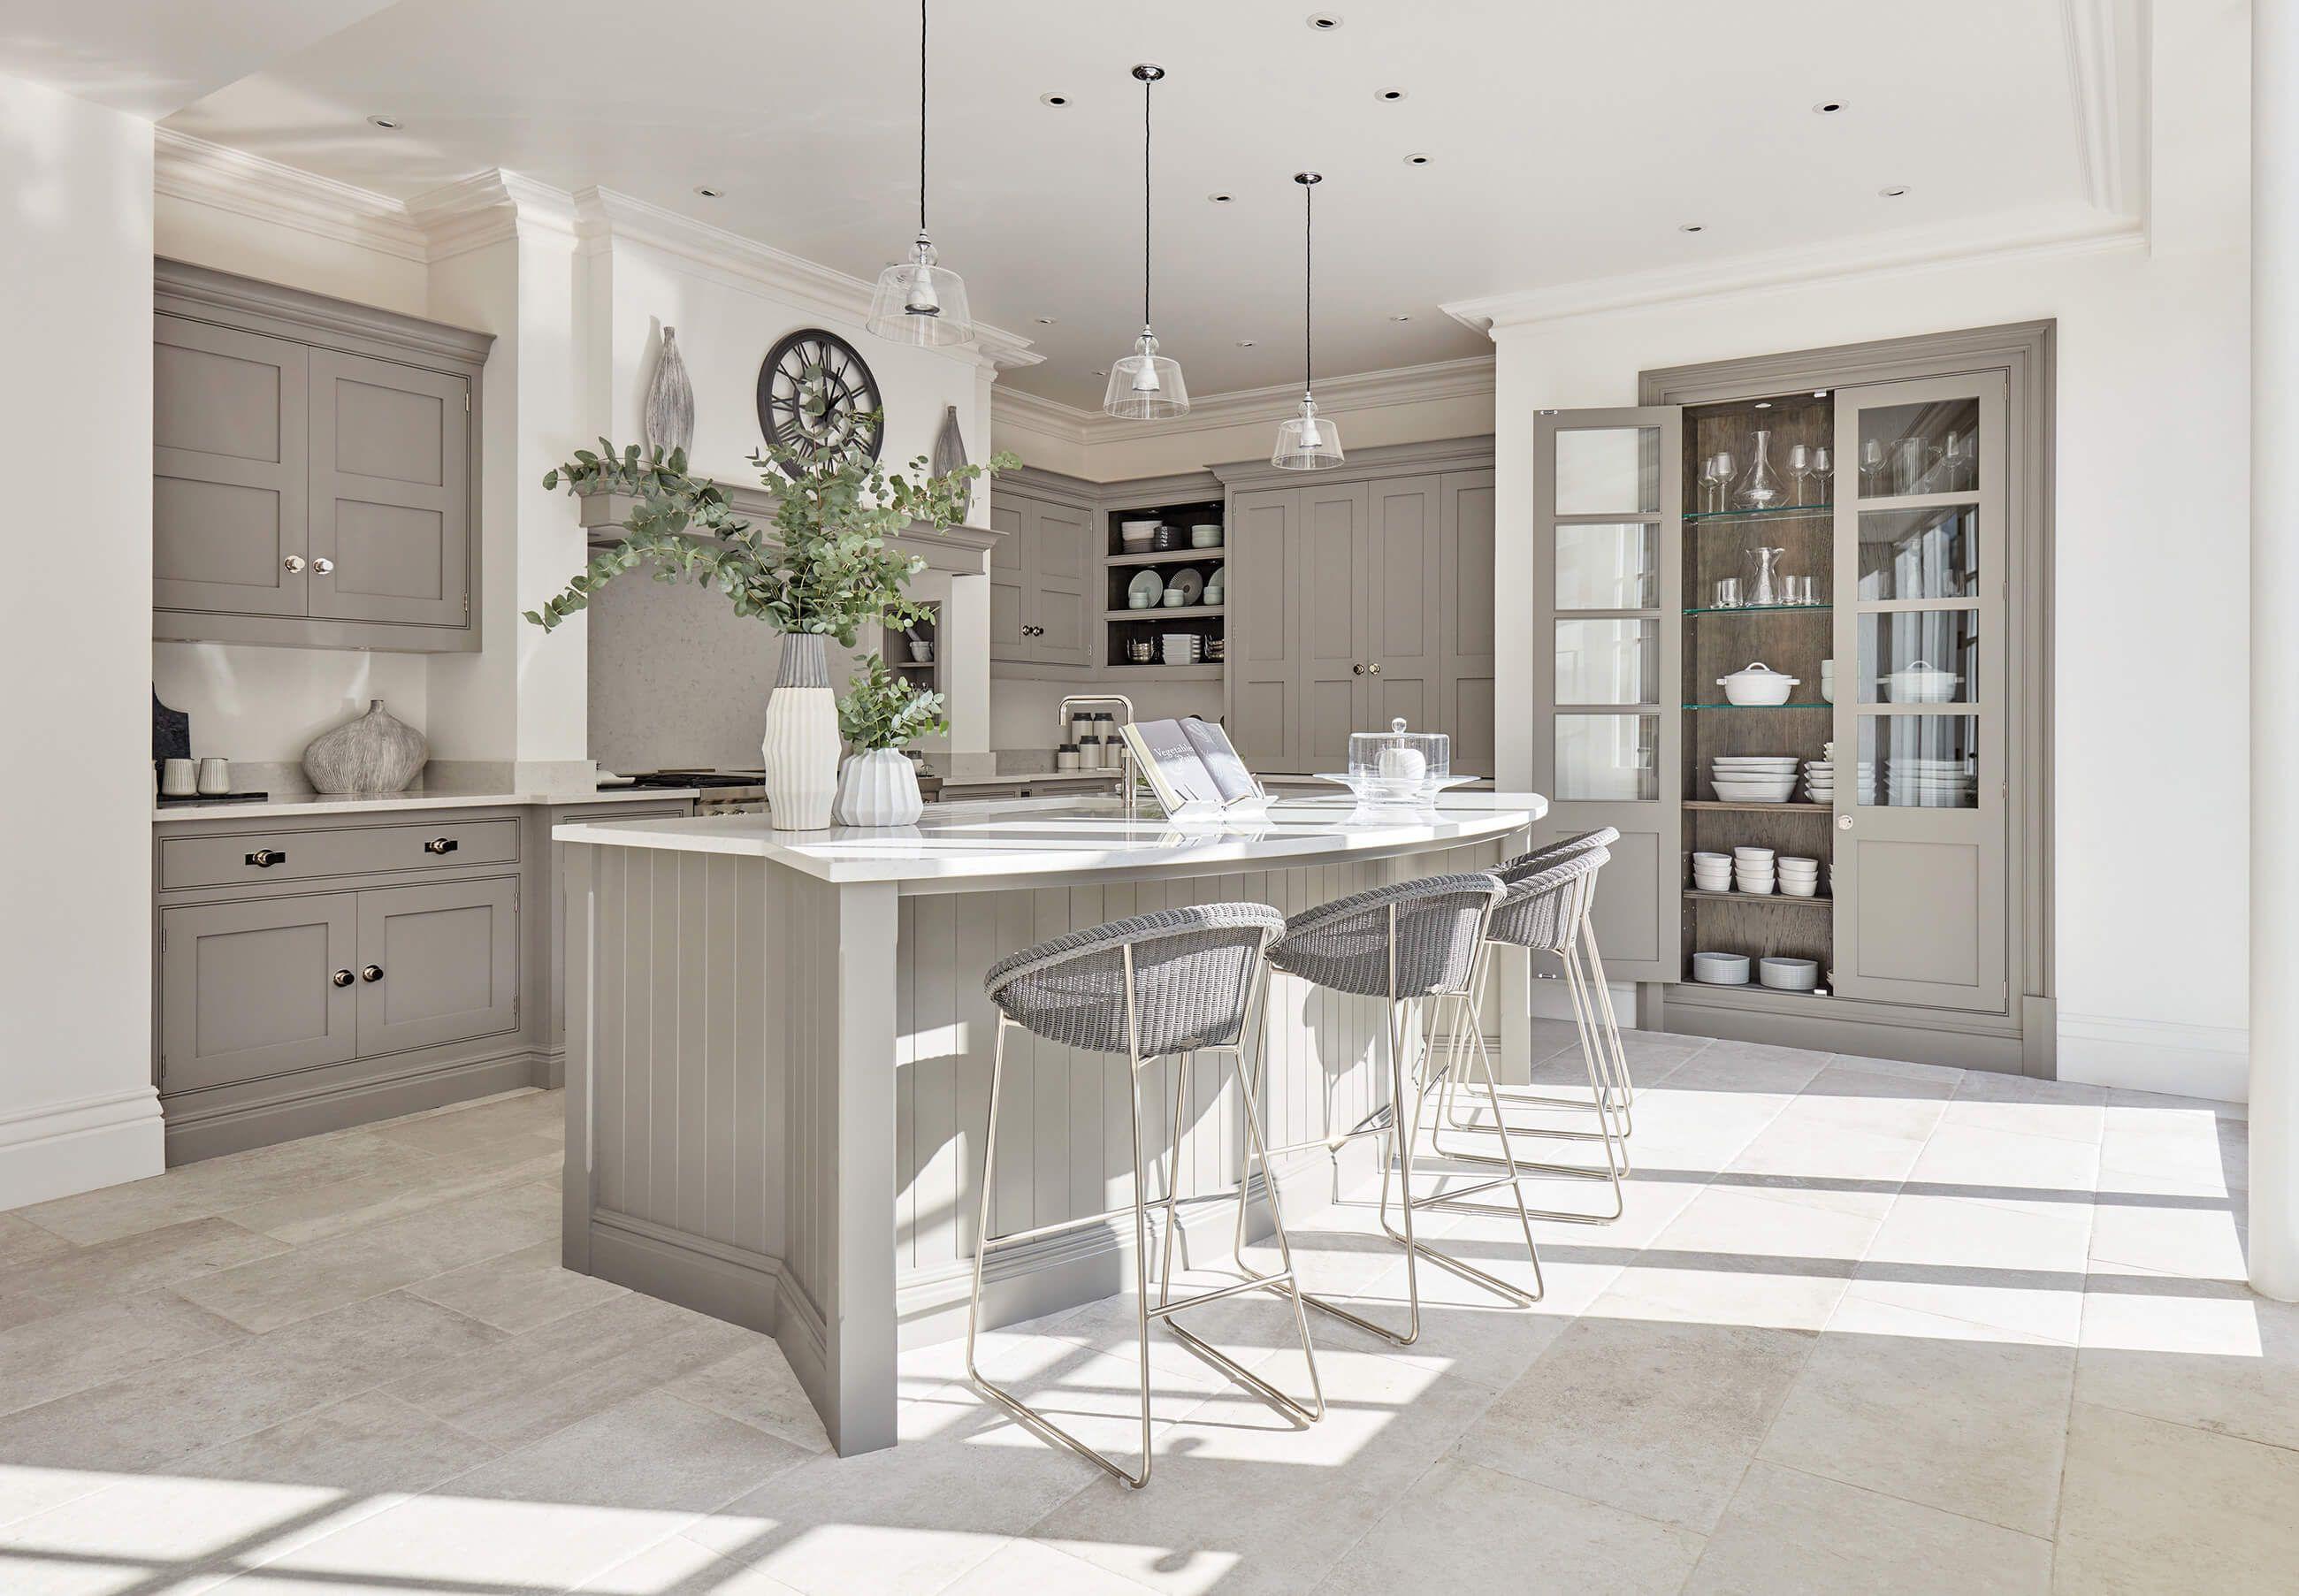 grey painted kitchen in 2020 grey painted kitchen stylish kitchen tom howley kitchens on kitchen decor grey cabinets id=17431